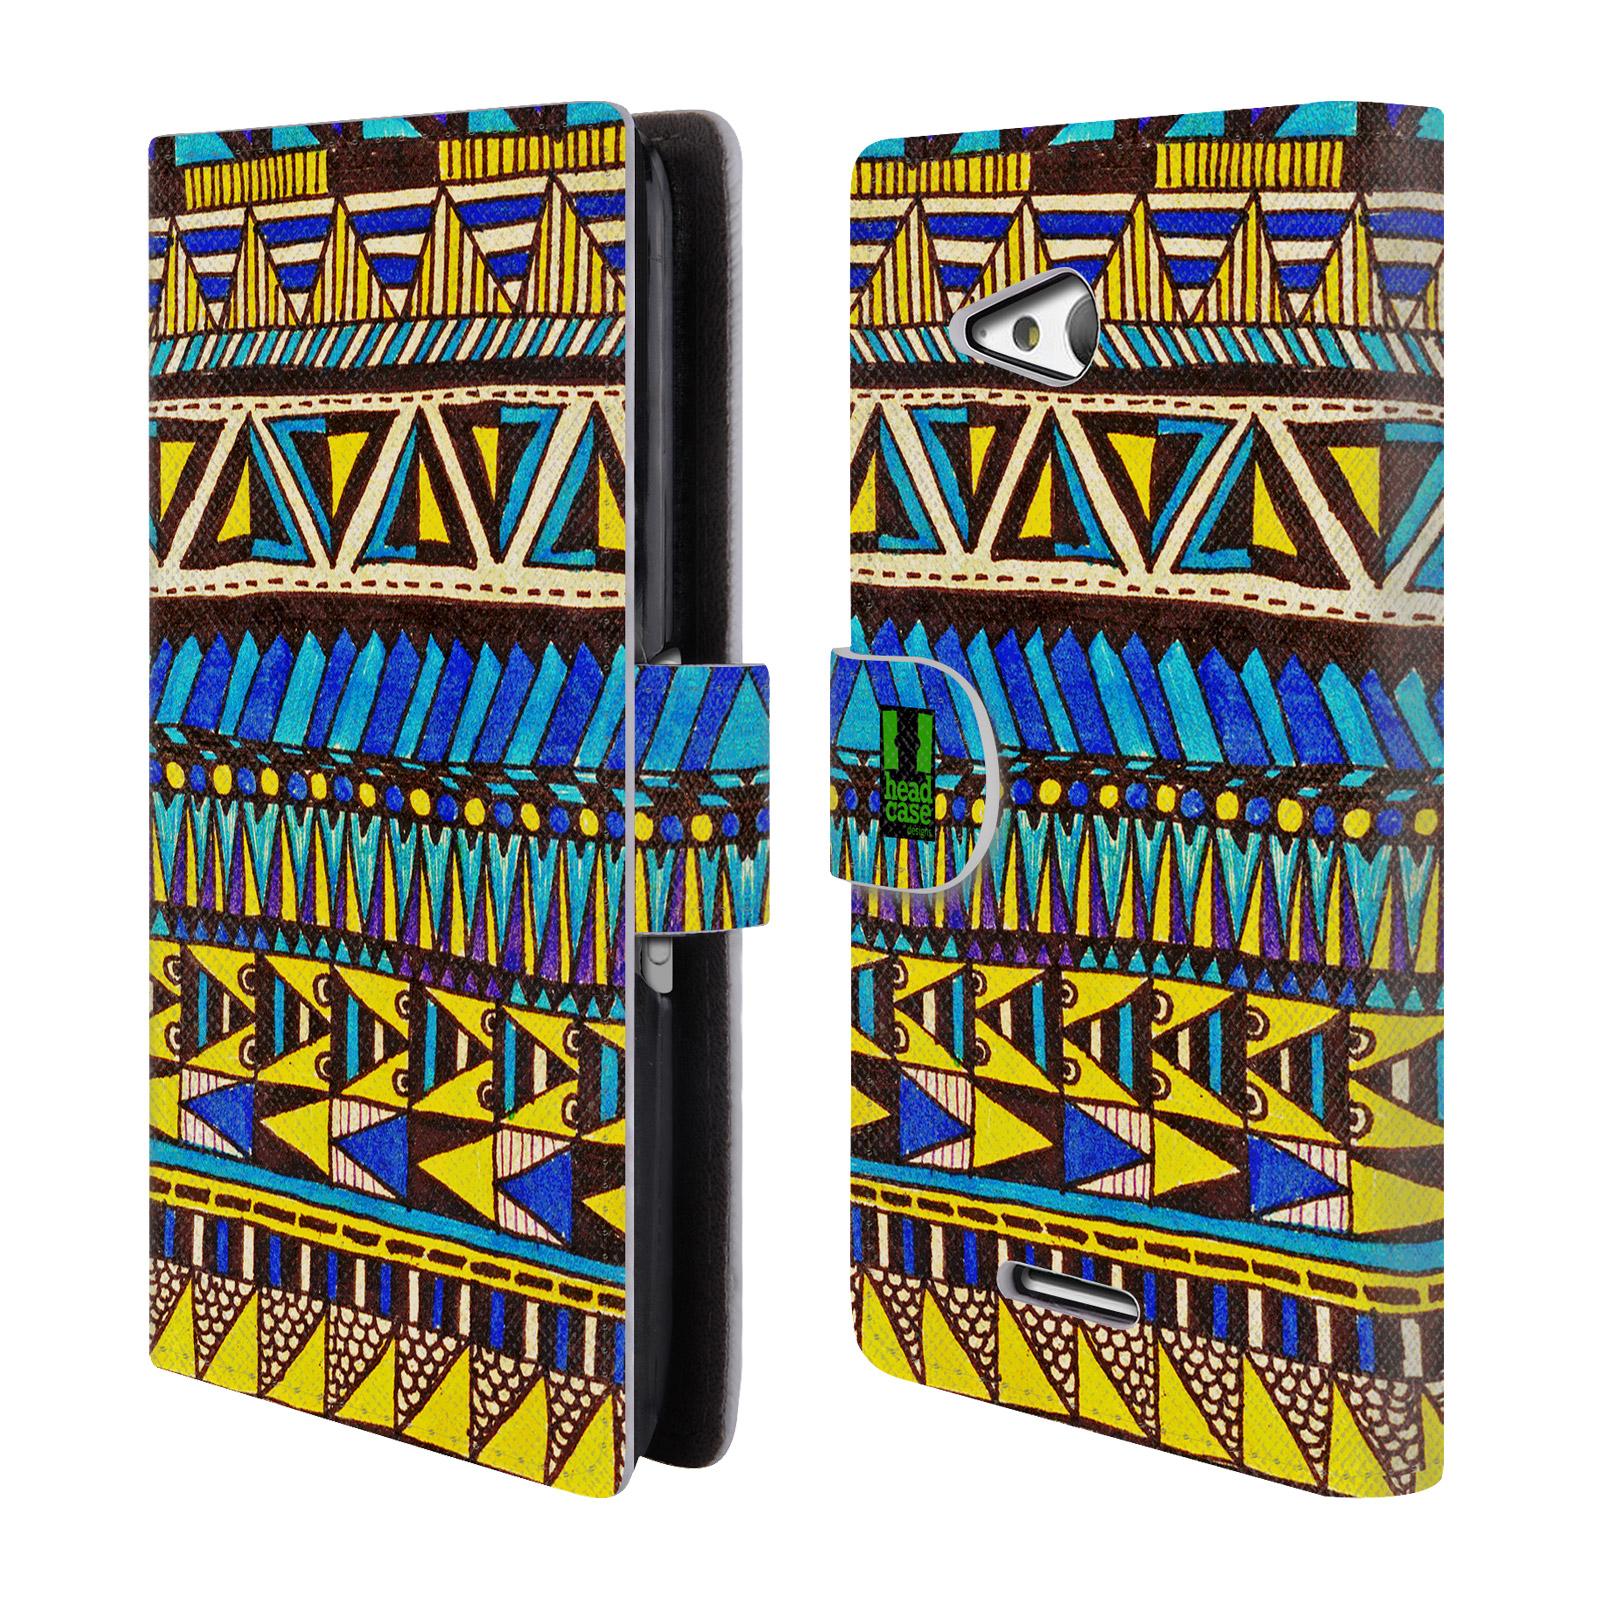 HEAD CASE Flipové pouzdro pro mobil SONY XPERIA E4g Barevná aztécká čmáranice modrá